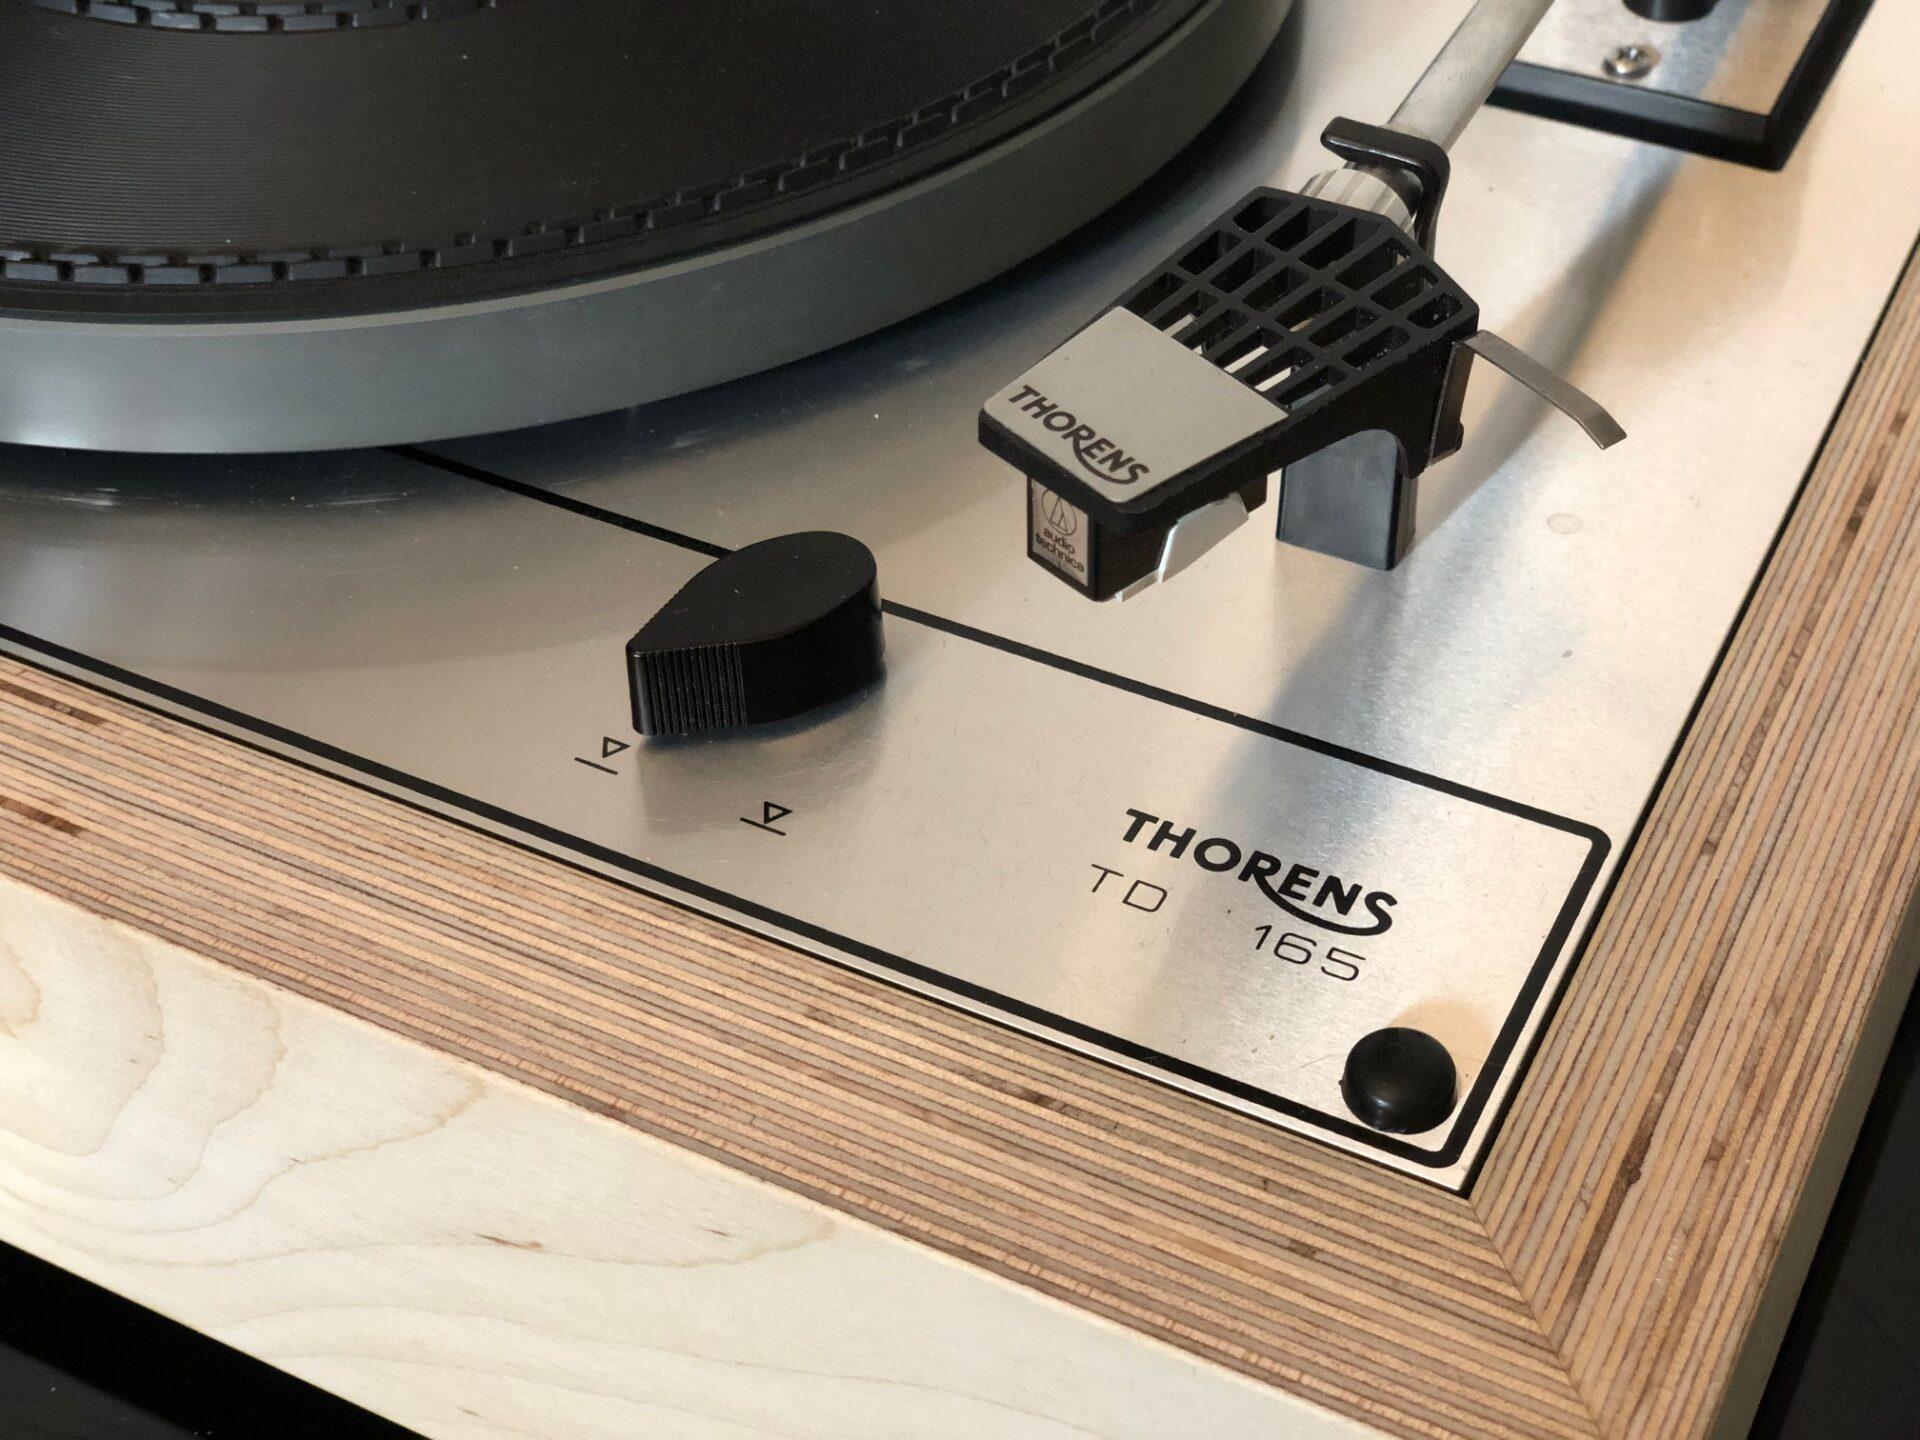 Thorens TD 165 15